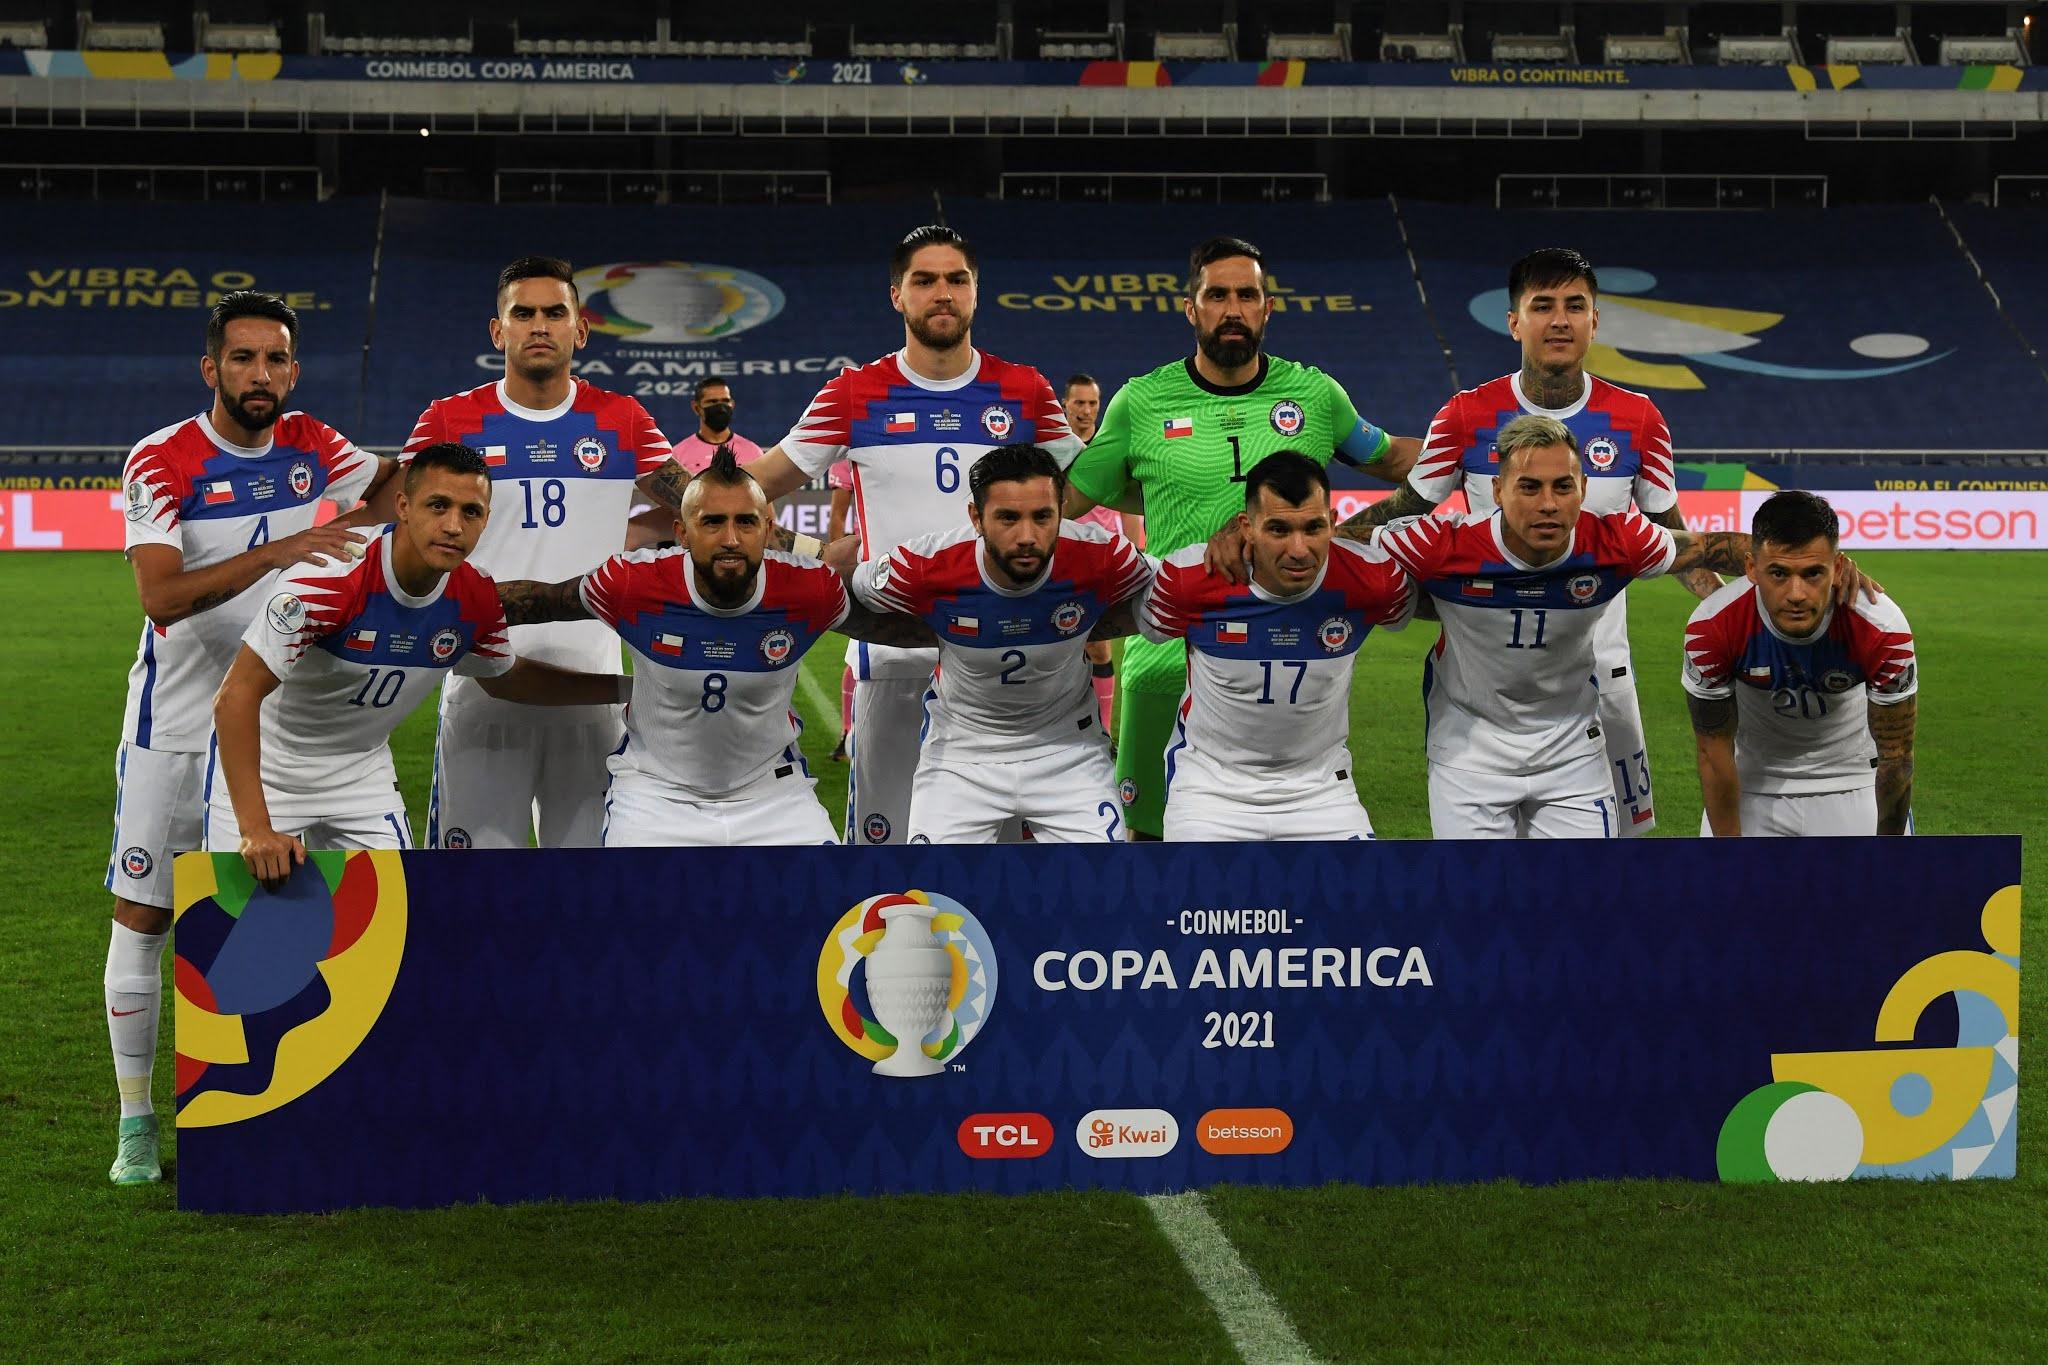 Formación de Chile ante Brasil, Copa América 2021, 2 de julio